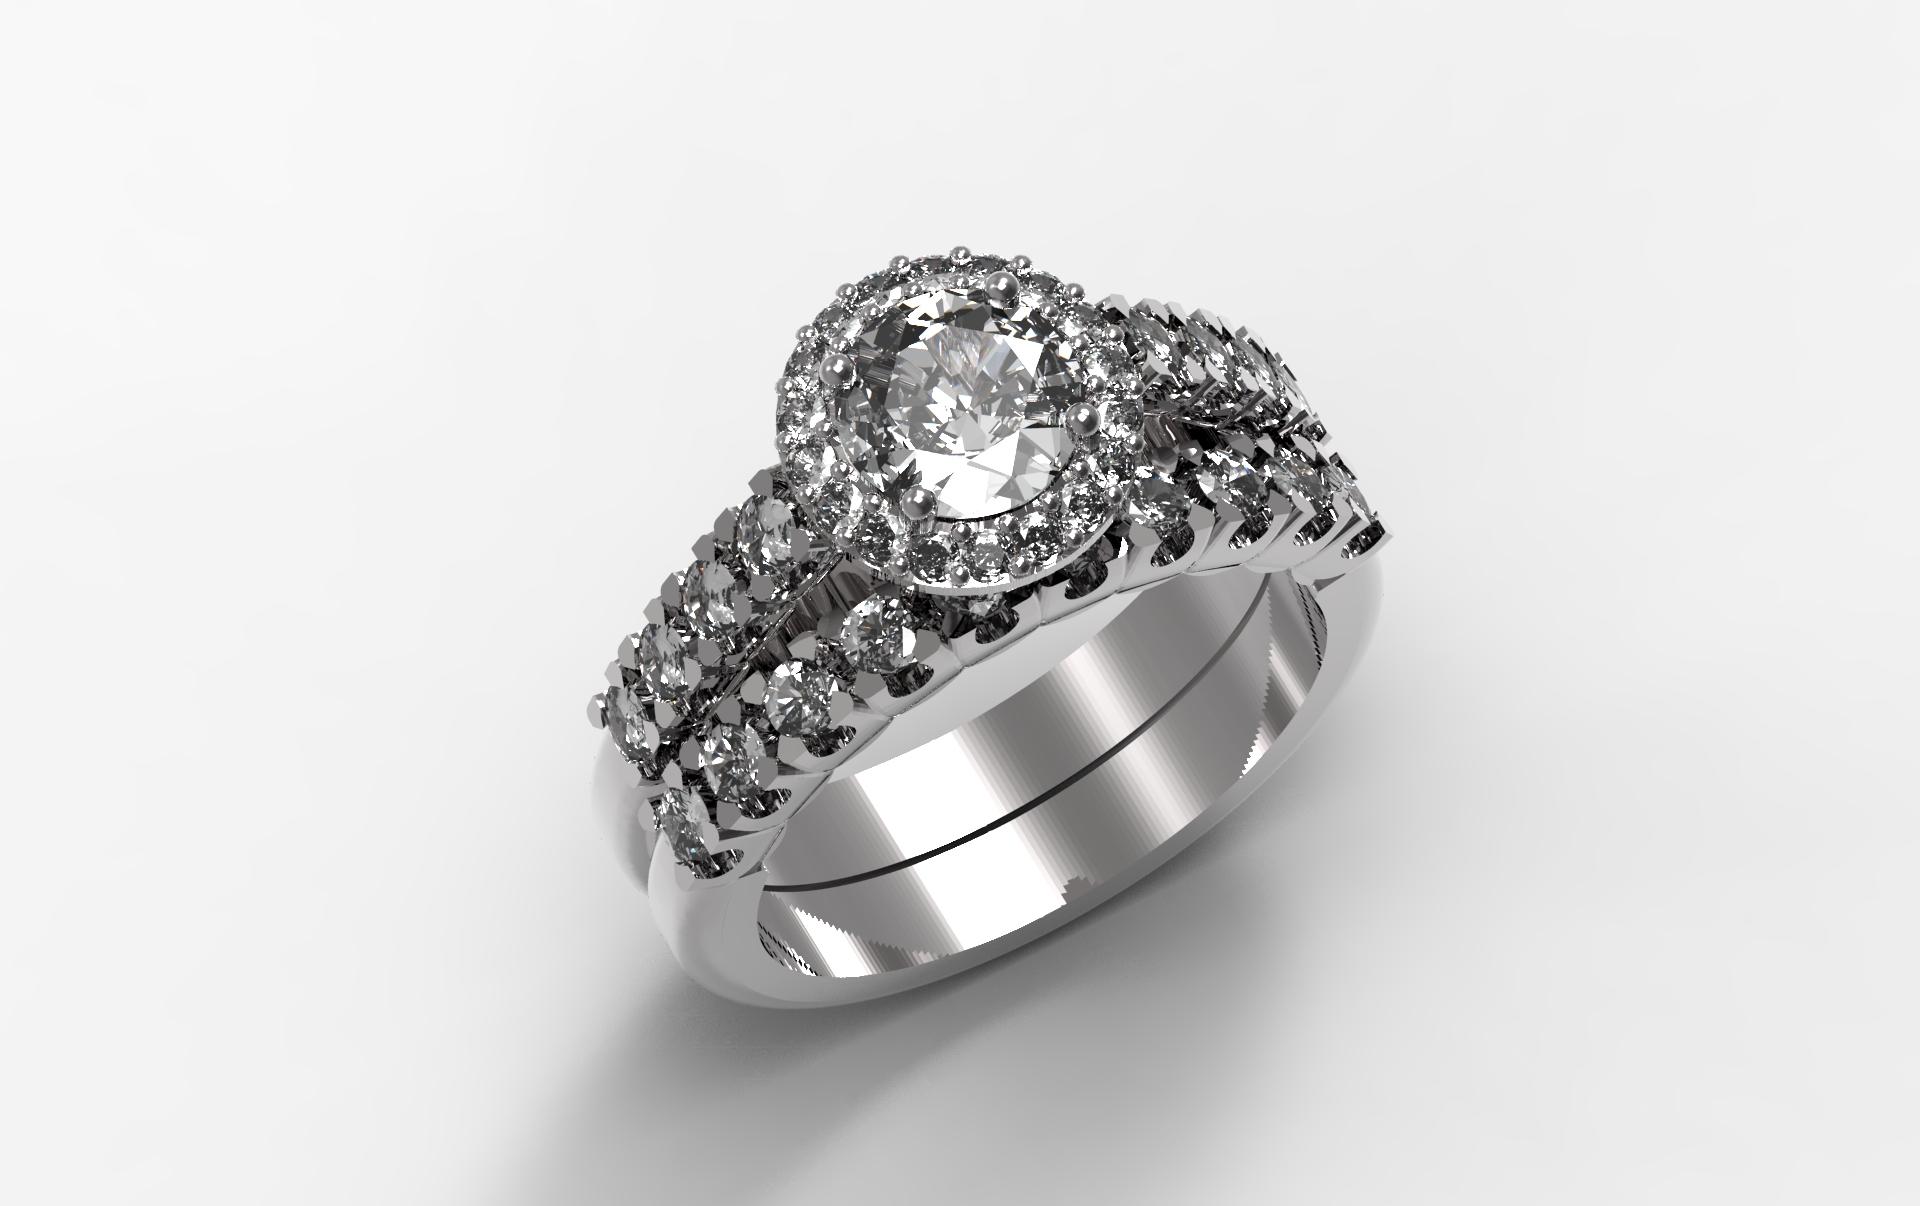 Custom Engagement Ring With Brilliant Round Center Diamond And Stones Matching Wedding